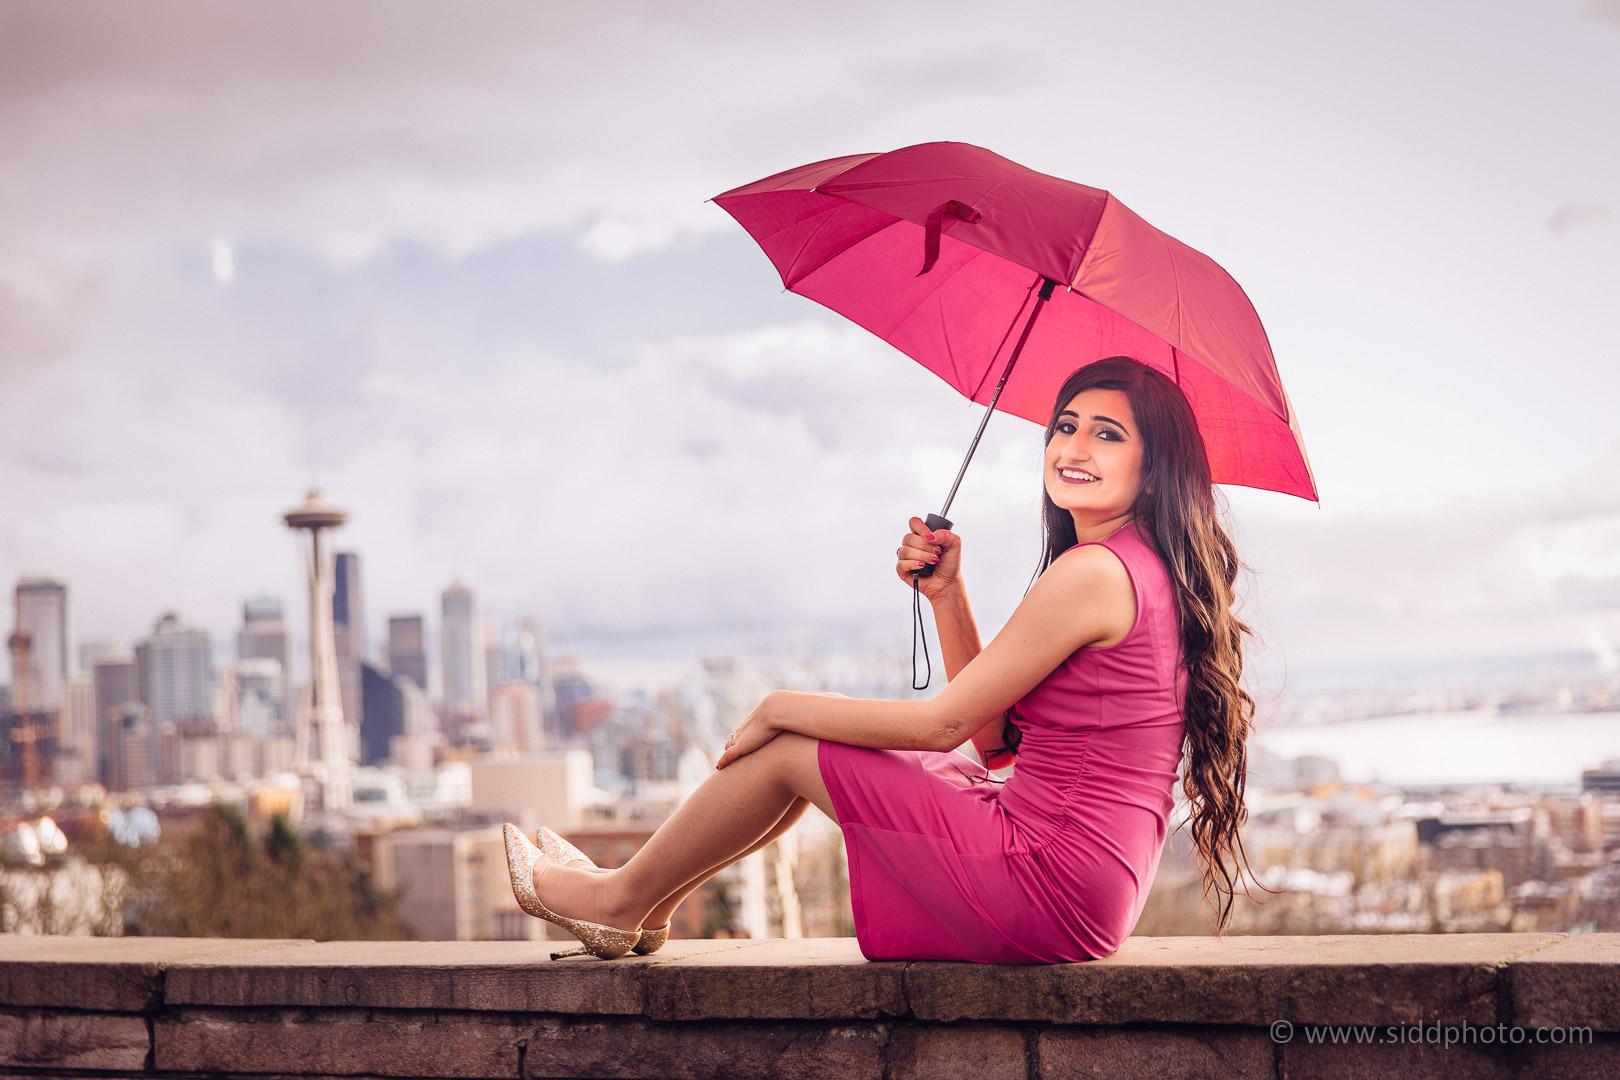 2014-12-28 - Sumedha Prateek Photoshoot - _O5C0830-01